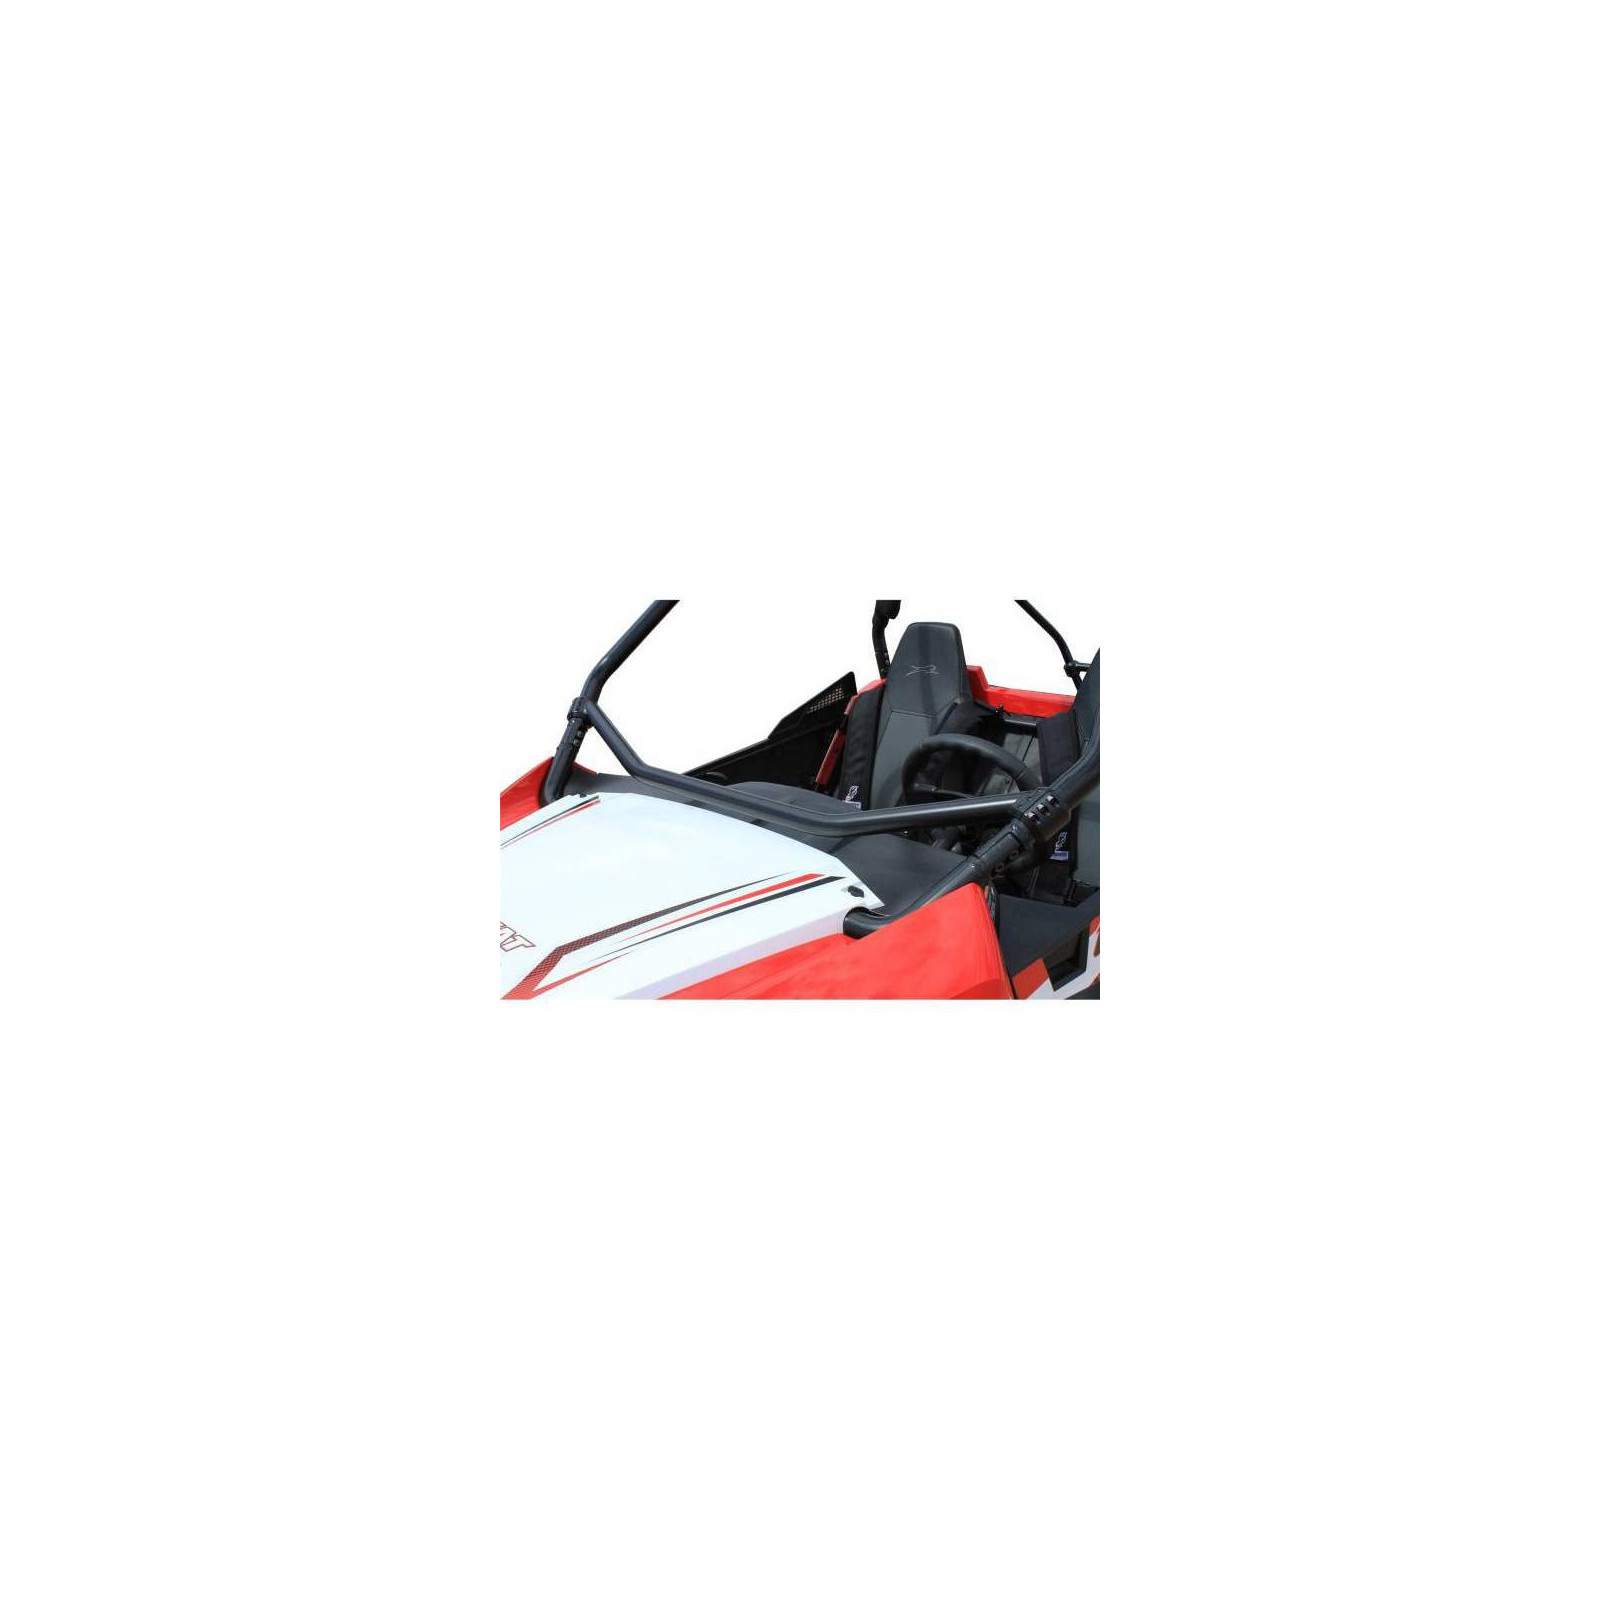 renfort arceau avant DRAGONFIRE rocksolid noir buggy ssv arctic cat 700 wildcat 2015 - 17 02-3704 bihr 446703